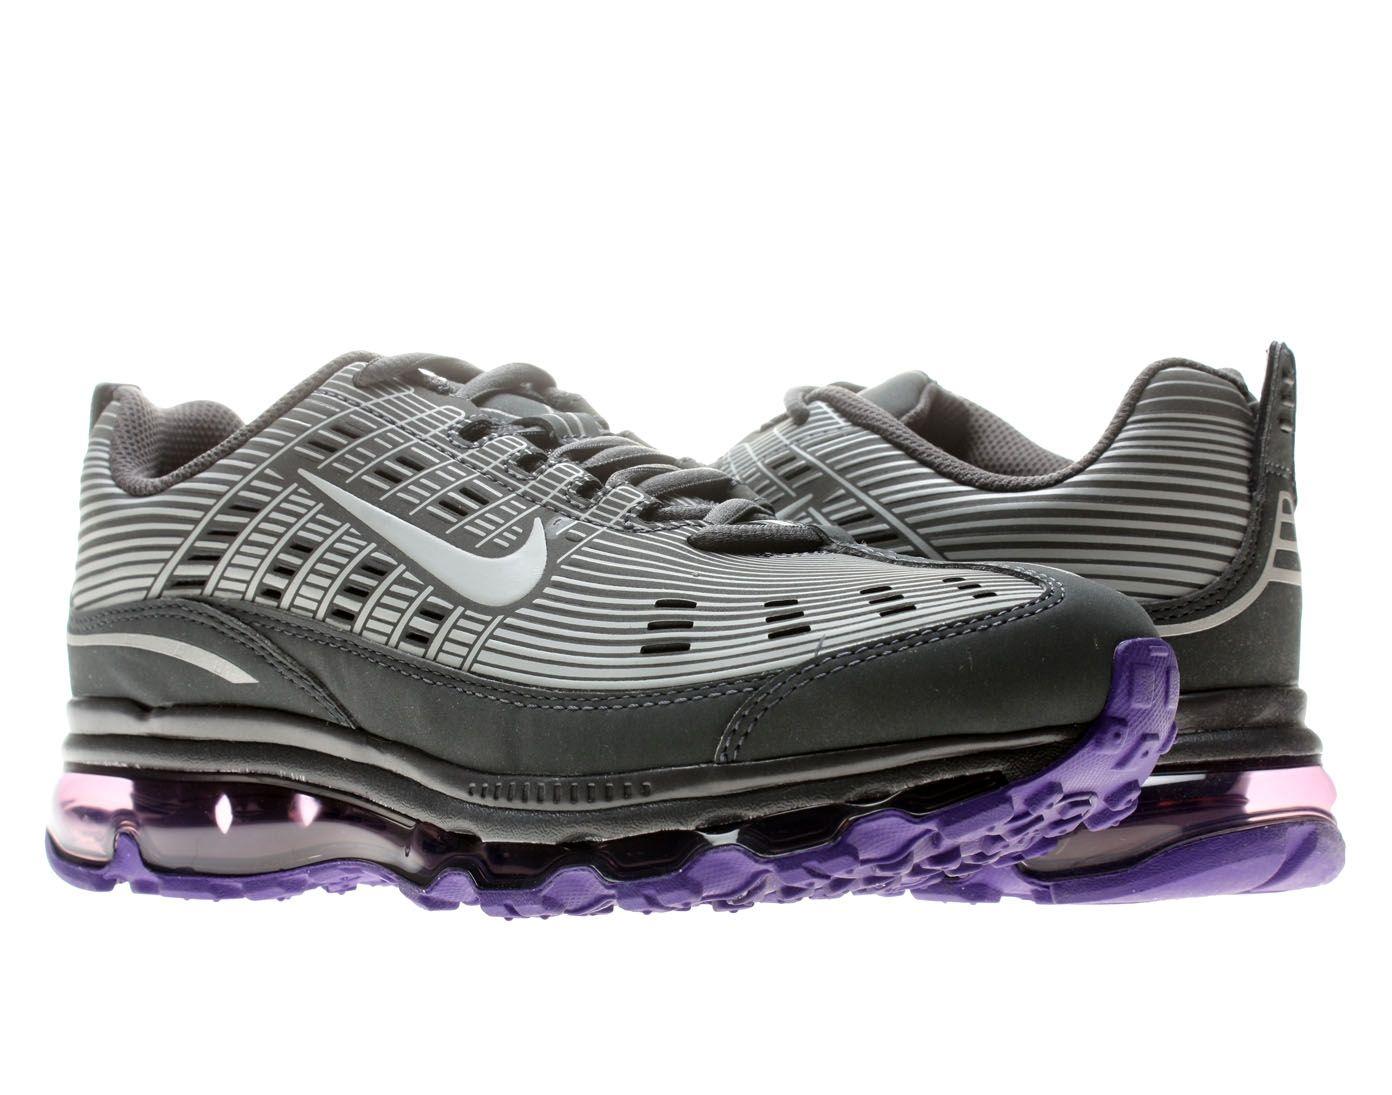 Air Max 2006 Running shoe reviews, Air max, Best running